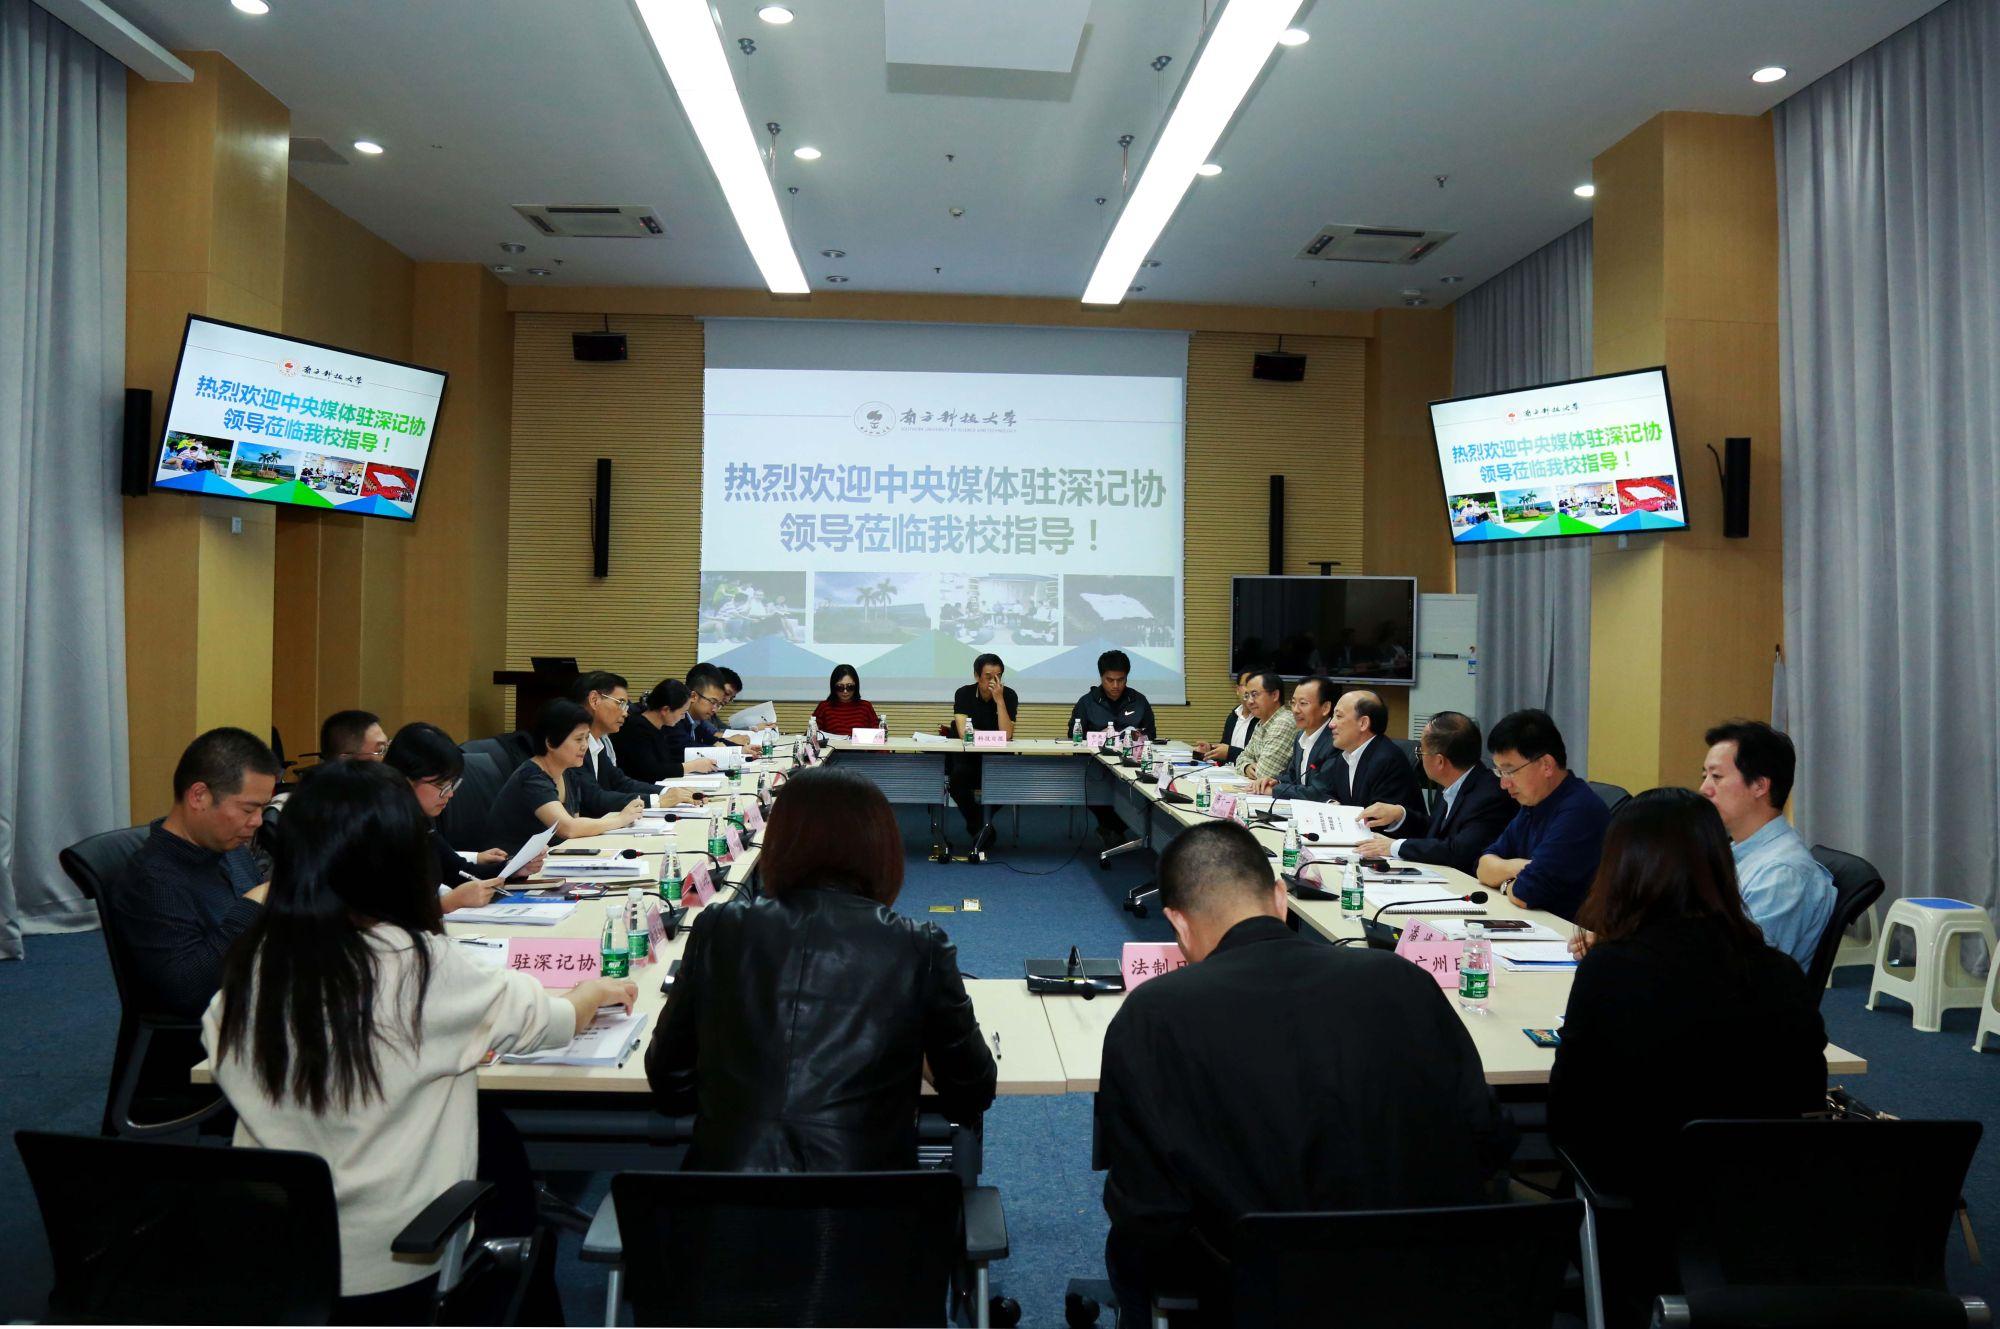 Journalists of central media in Shenzhen visit SUSTech